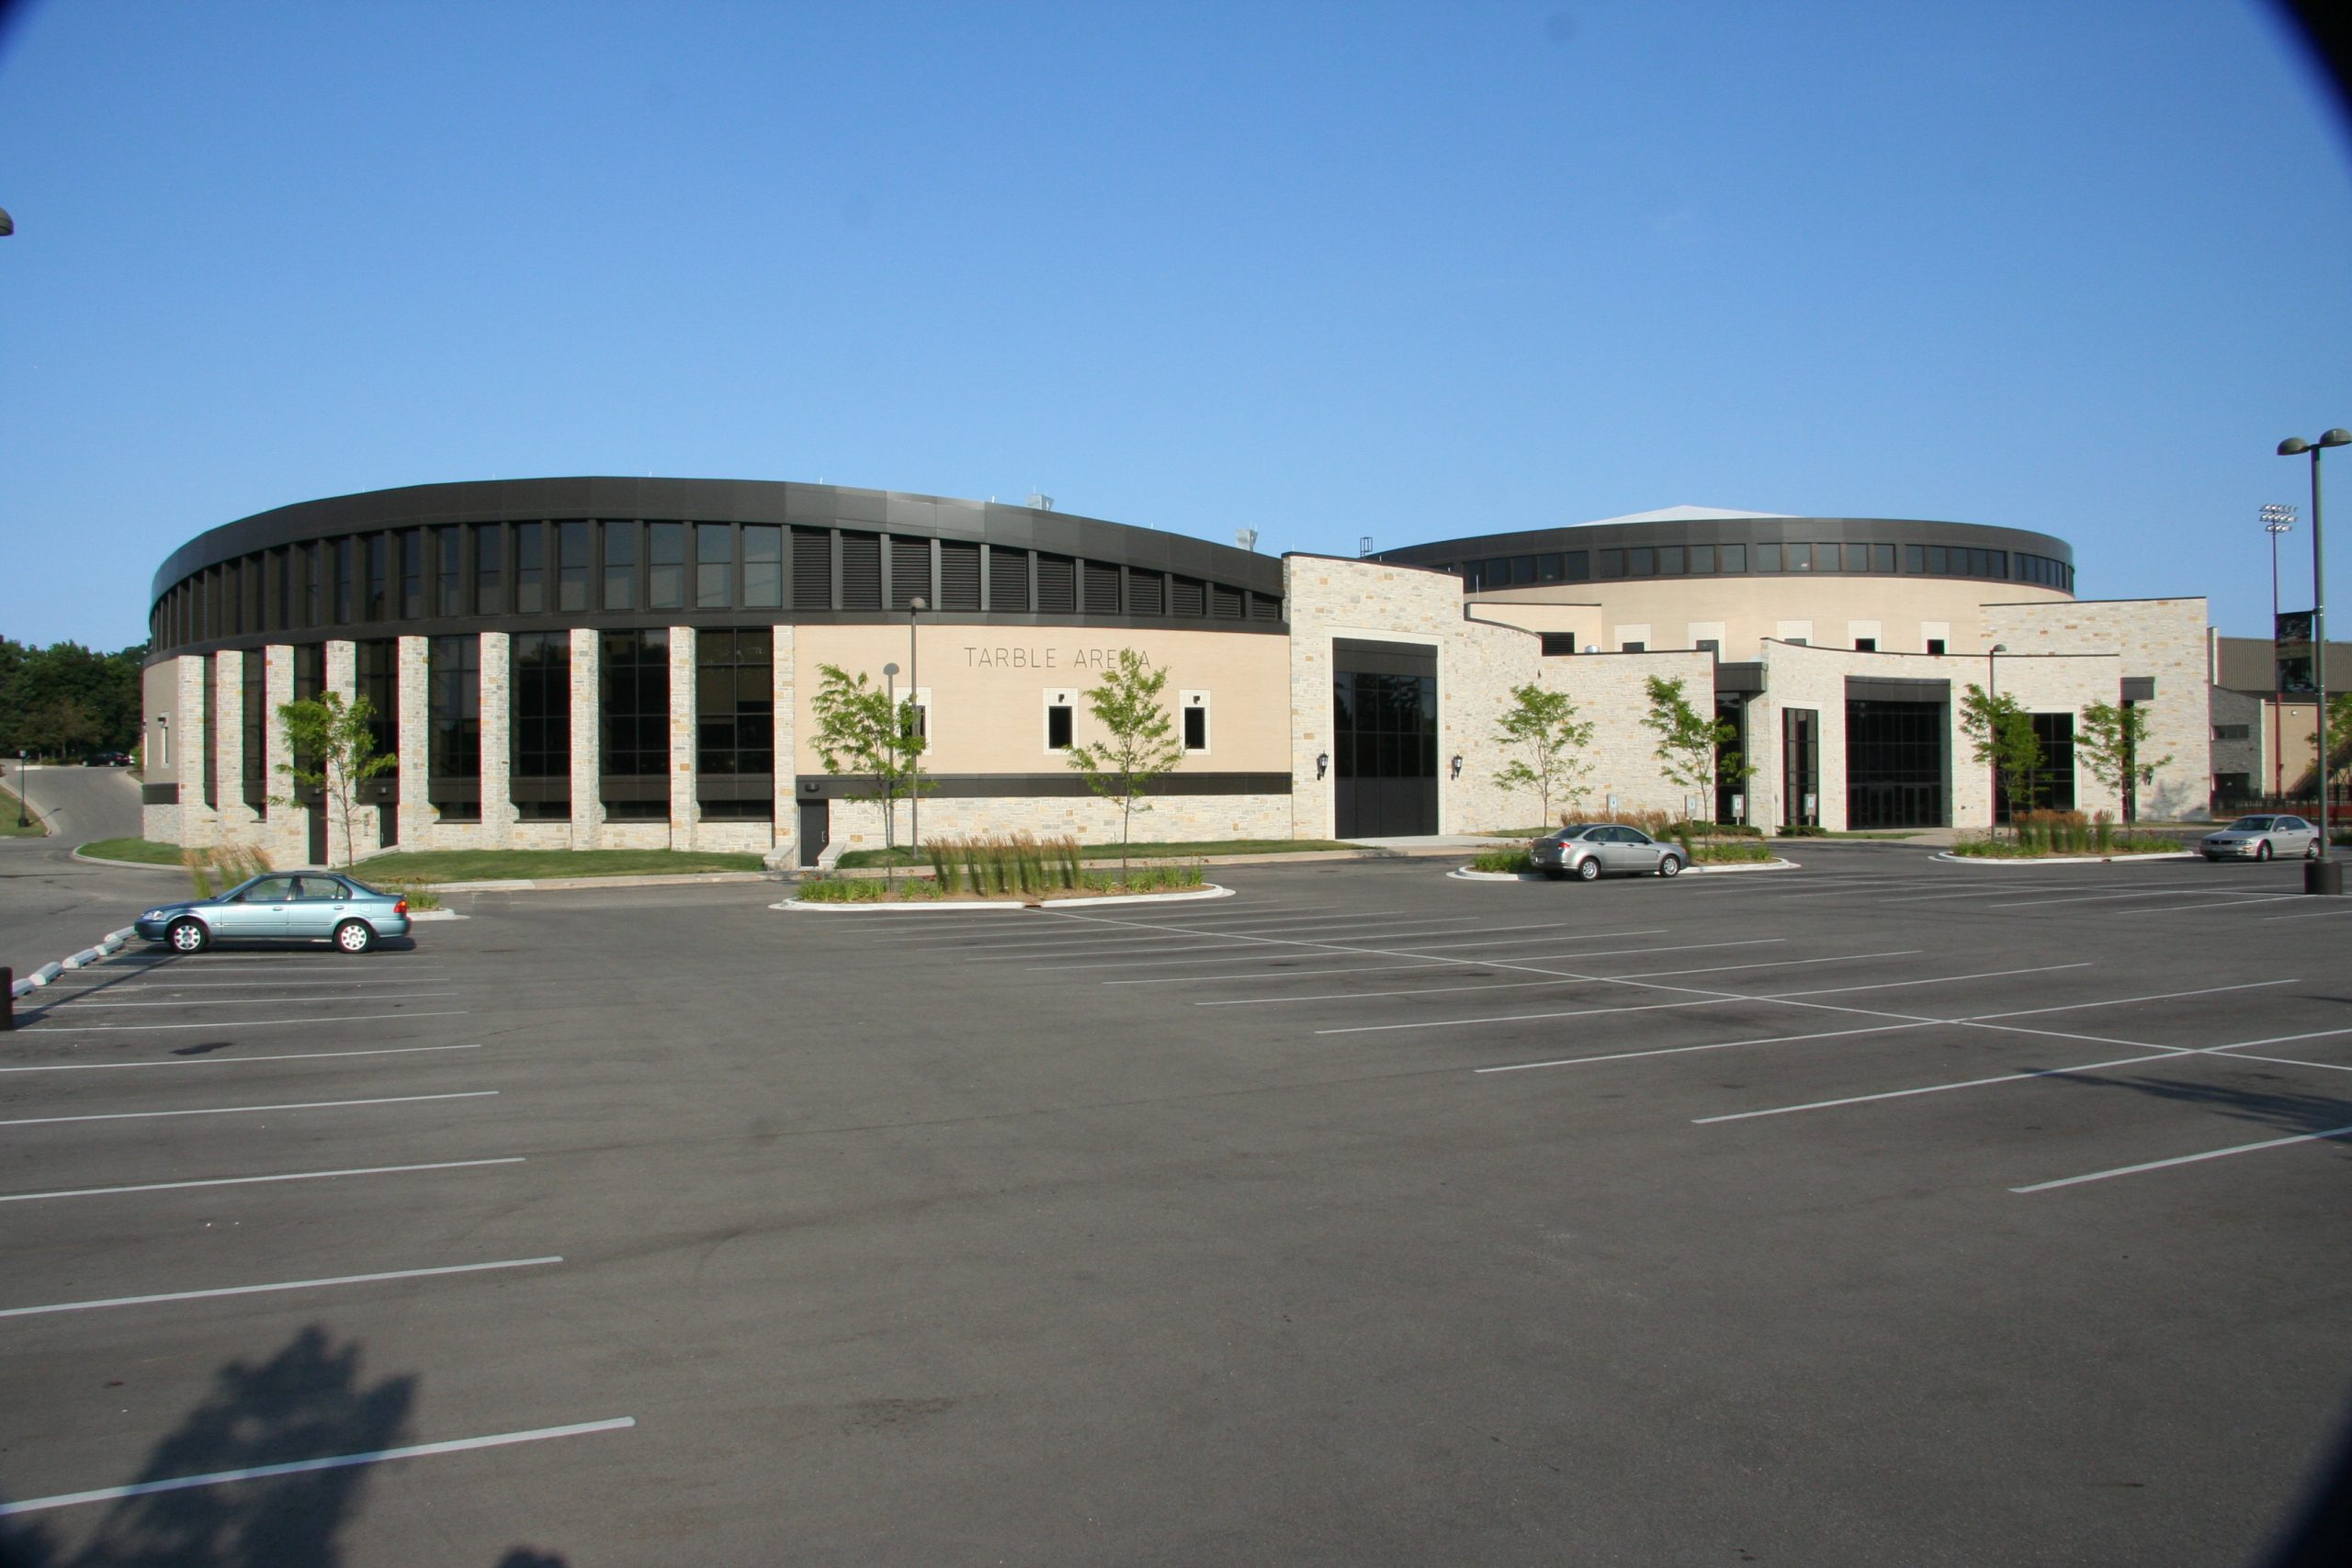 Carthage Tarble Arena